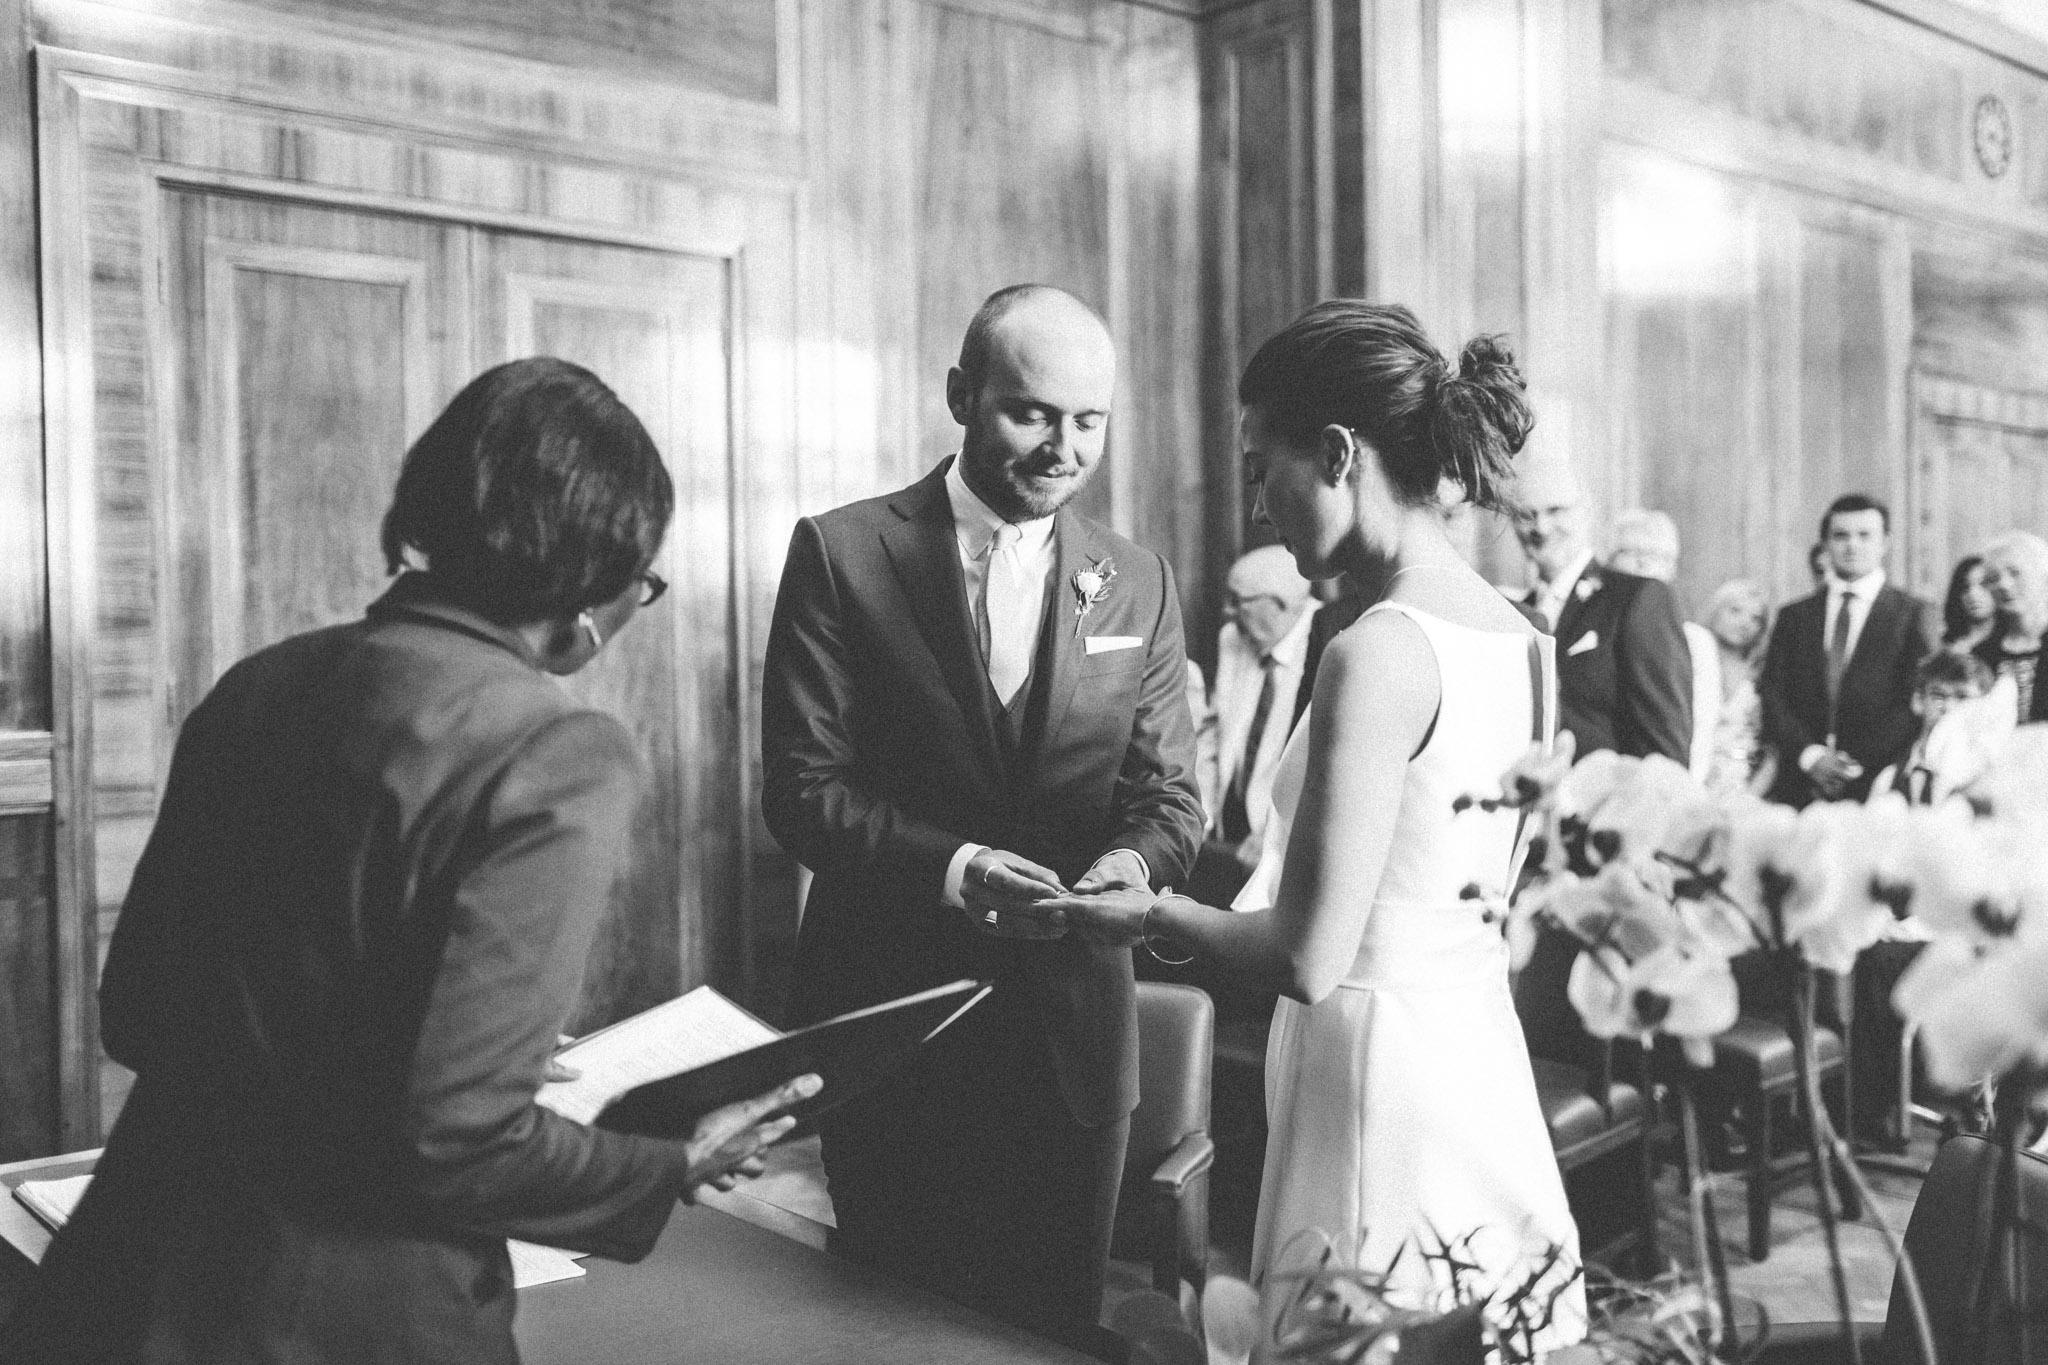 trinity_buoy_wharf_hackney_town_hall_wedding_374.jpg